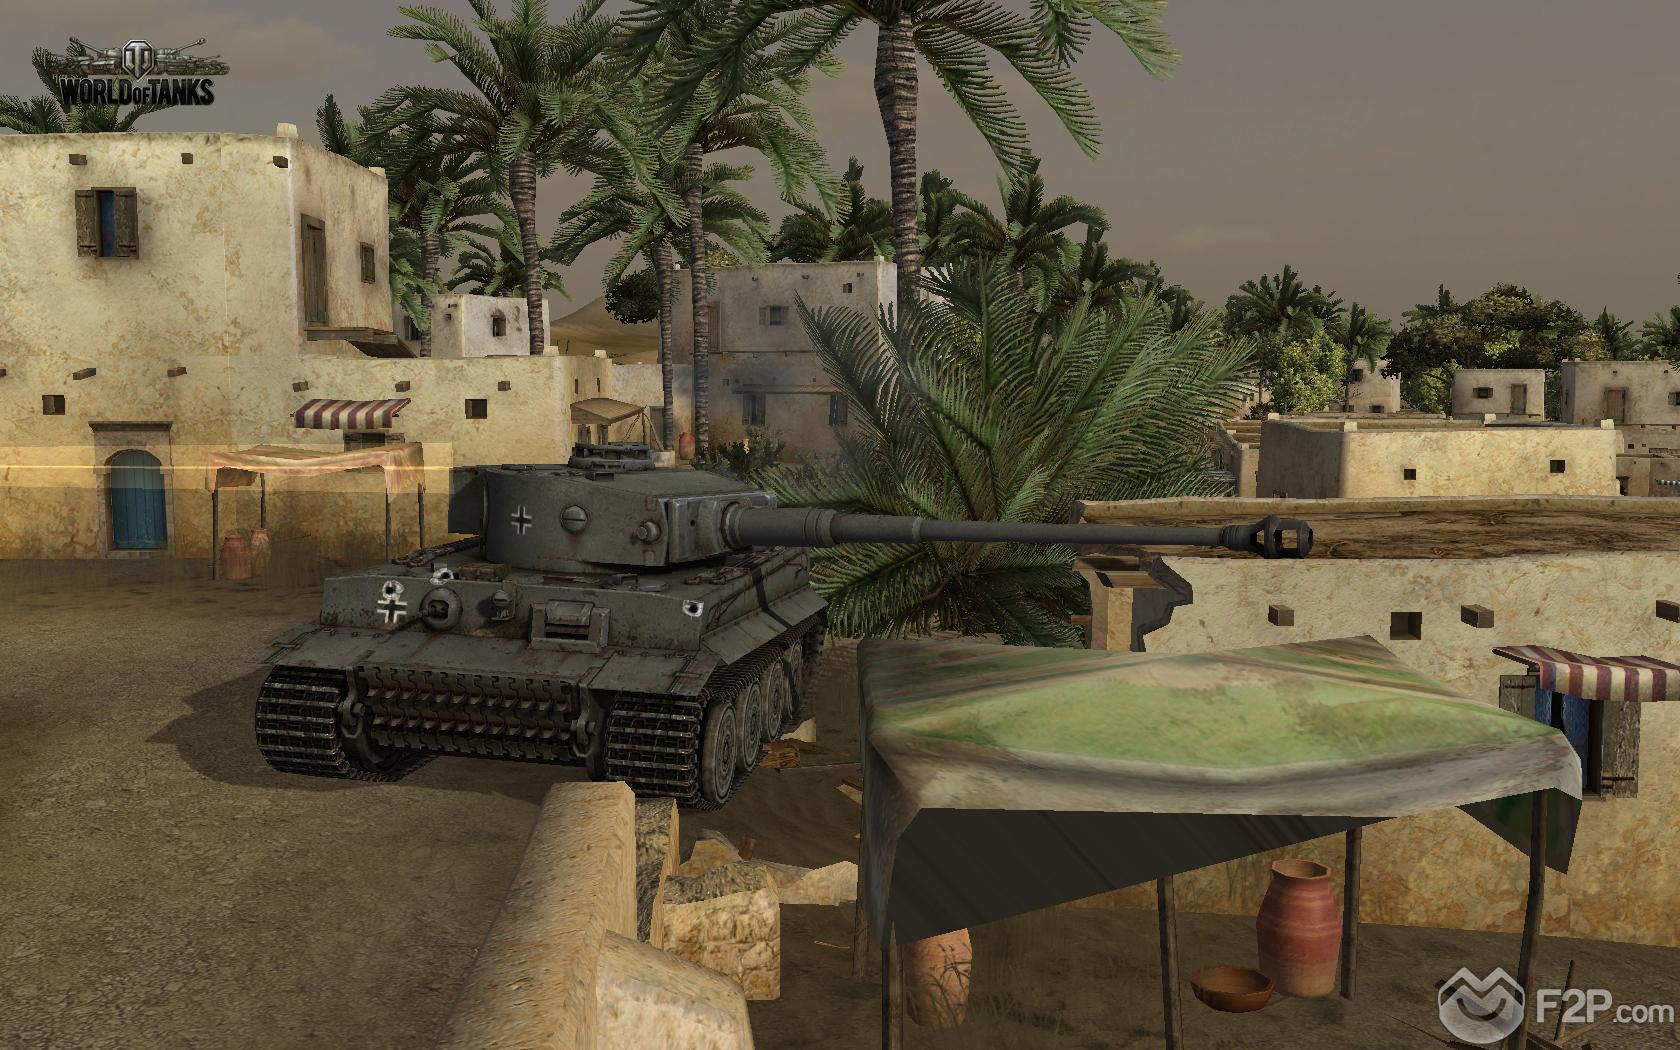 Click image for larger version.Name:World of Tanks 52.jpgViews:125Size:1.41 MBID:3847